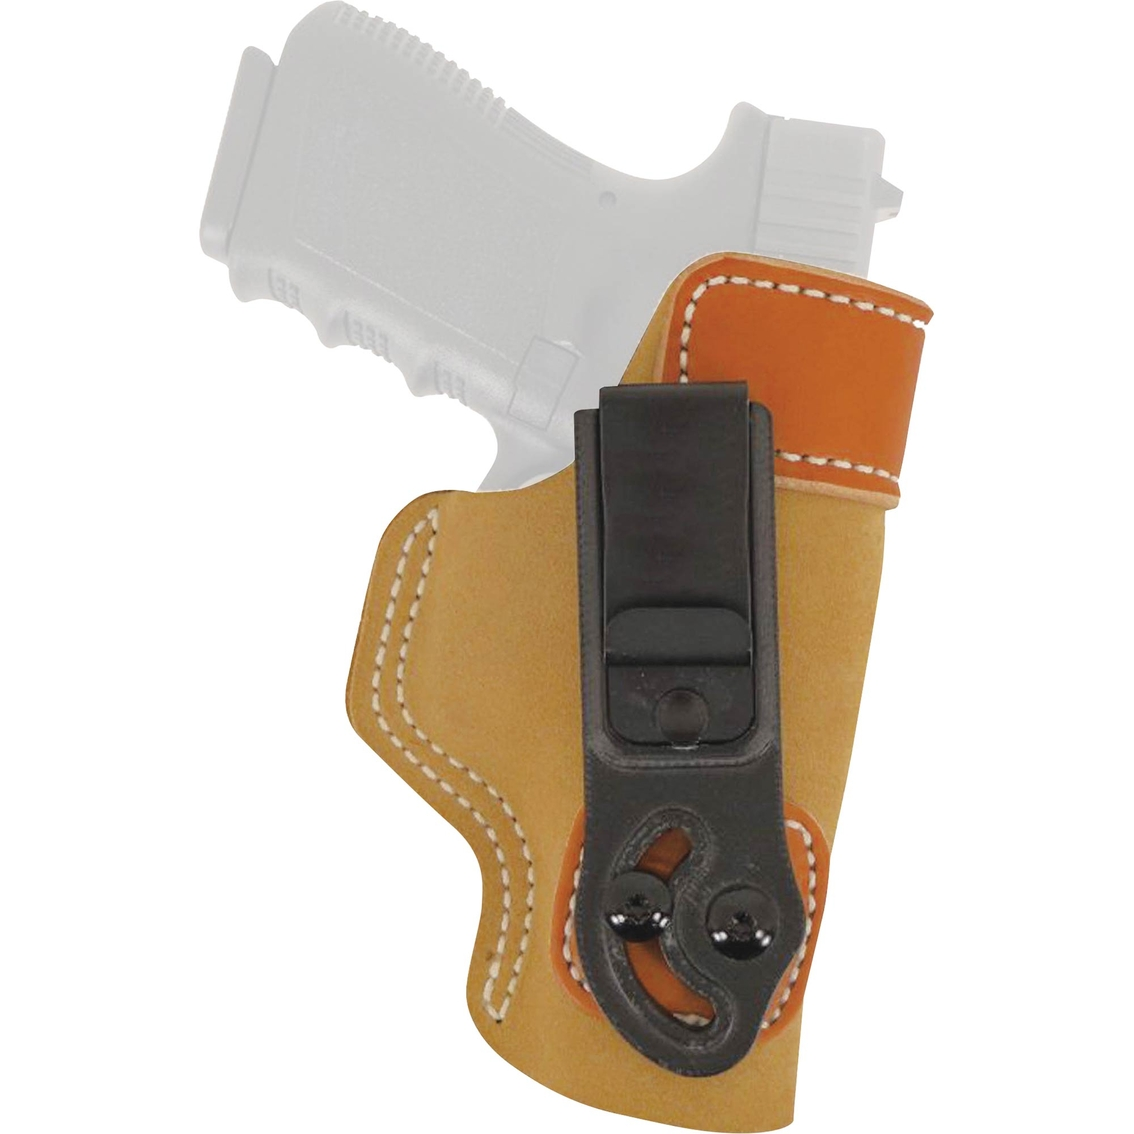 Desantis Sof-tuck Holster, Fits Glock 43, Kahr Pm9/40 | Holsters